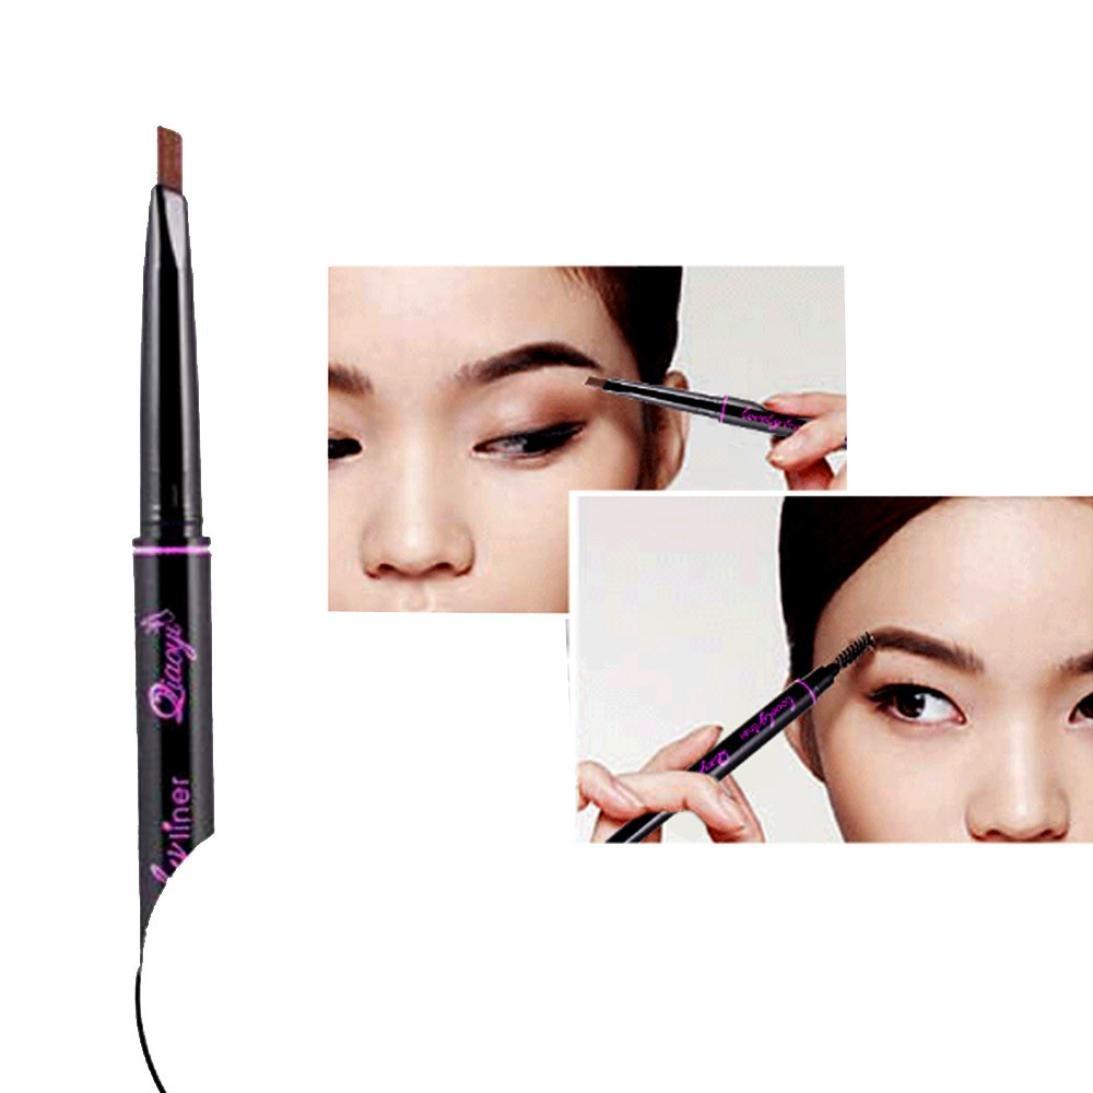 CYCTECH Double-Headed Waterproof Eye Brow Eyeliner Eyebrow Pen Pencil With Brush Makeup Cosmetic Tool (Dark Coffee)